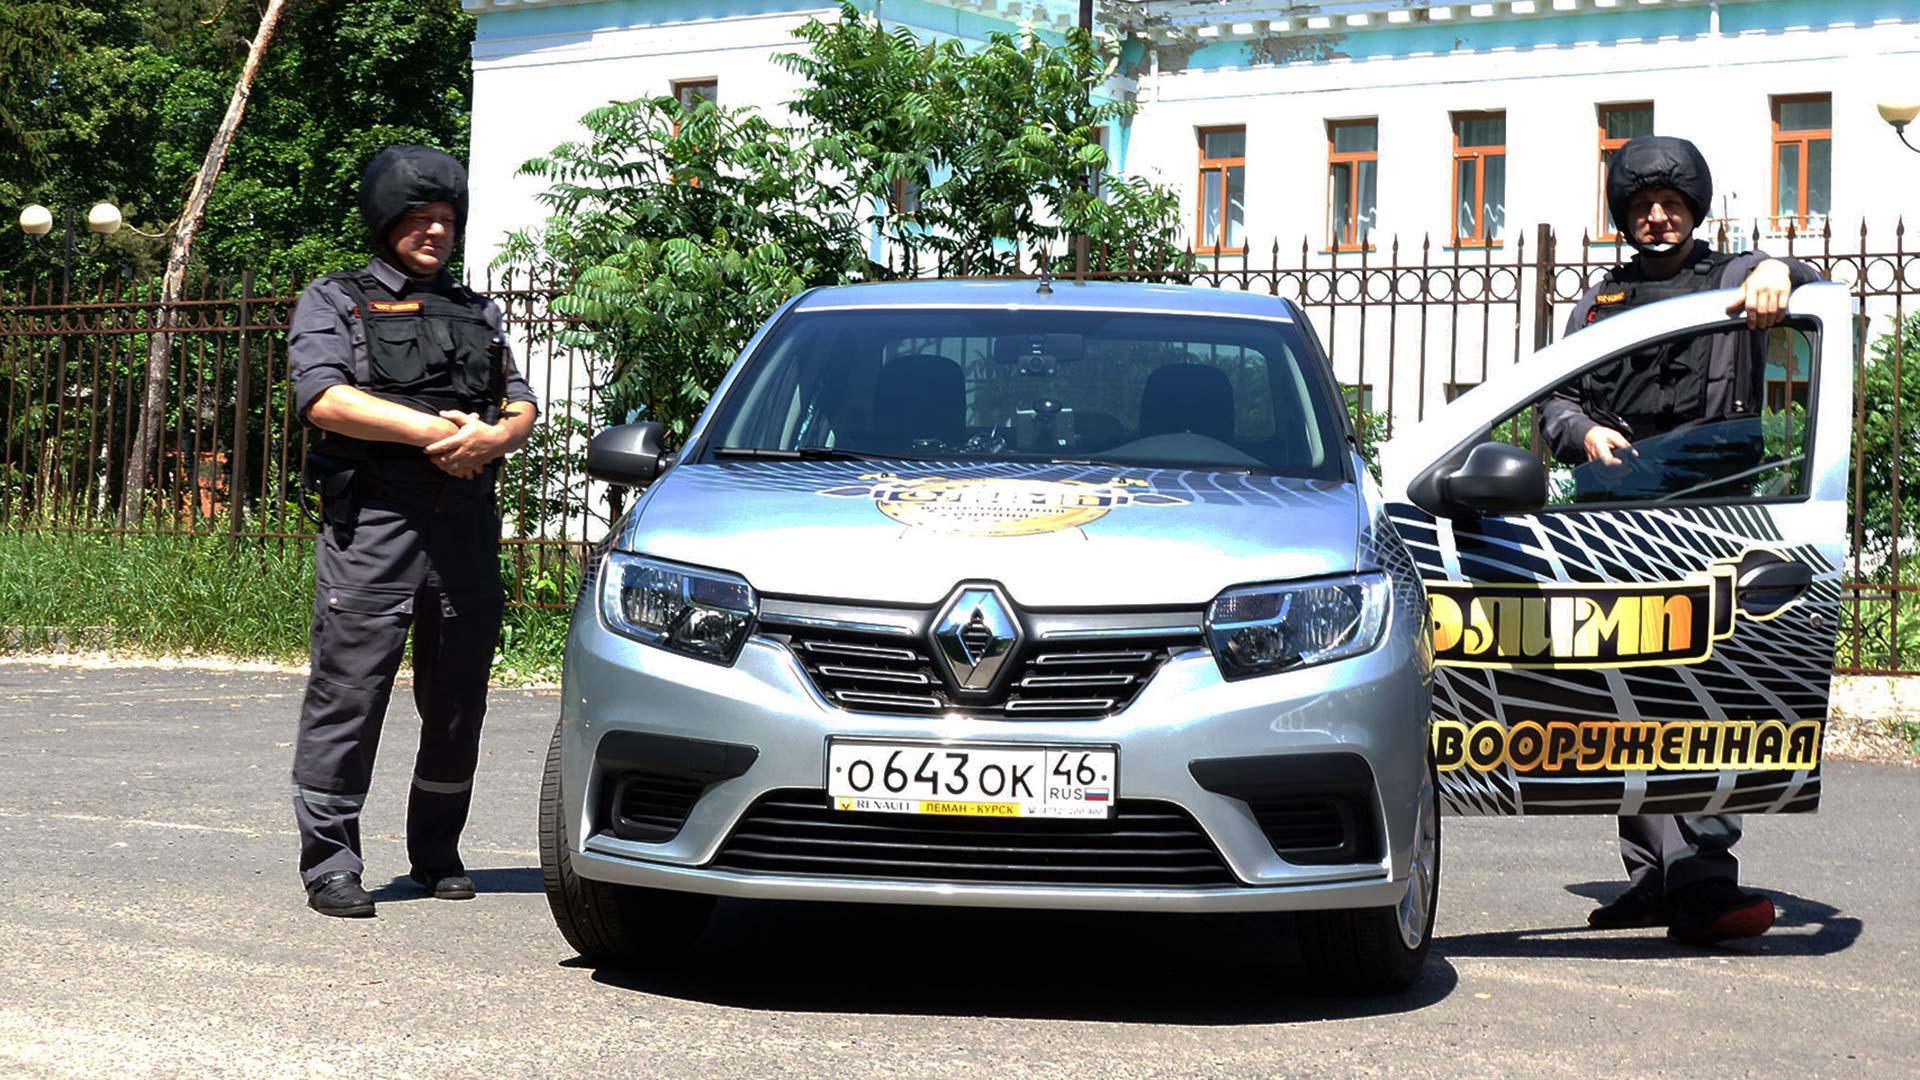 Охрана в Курске и Курской области